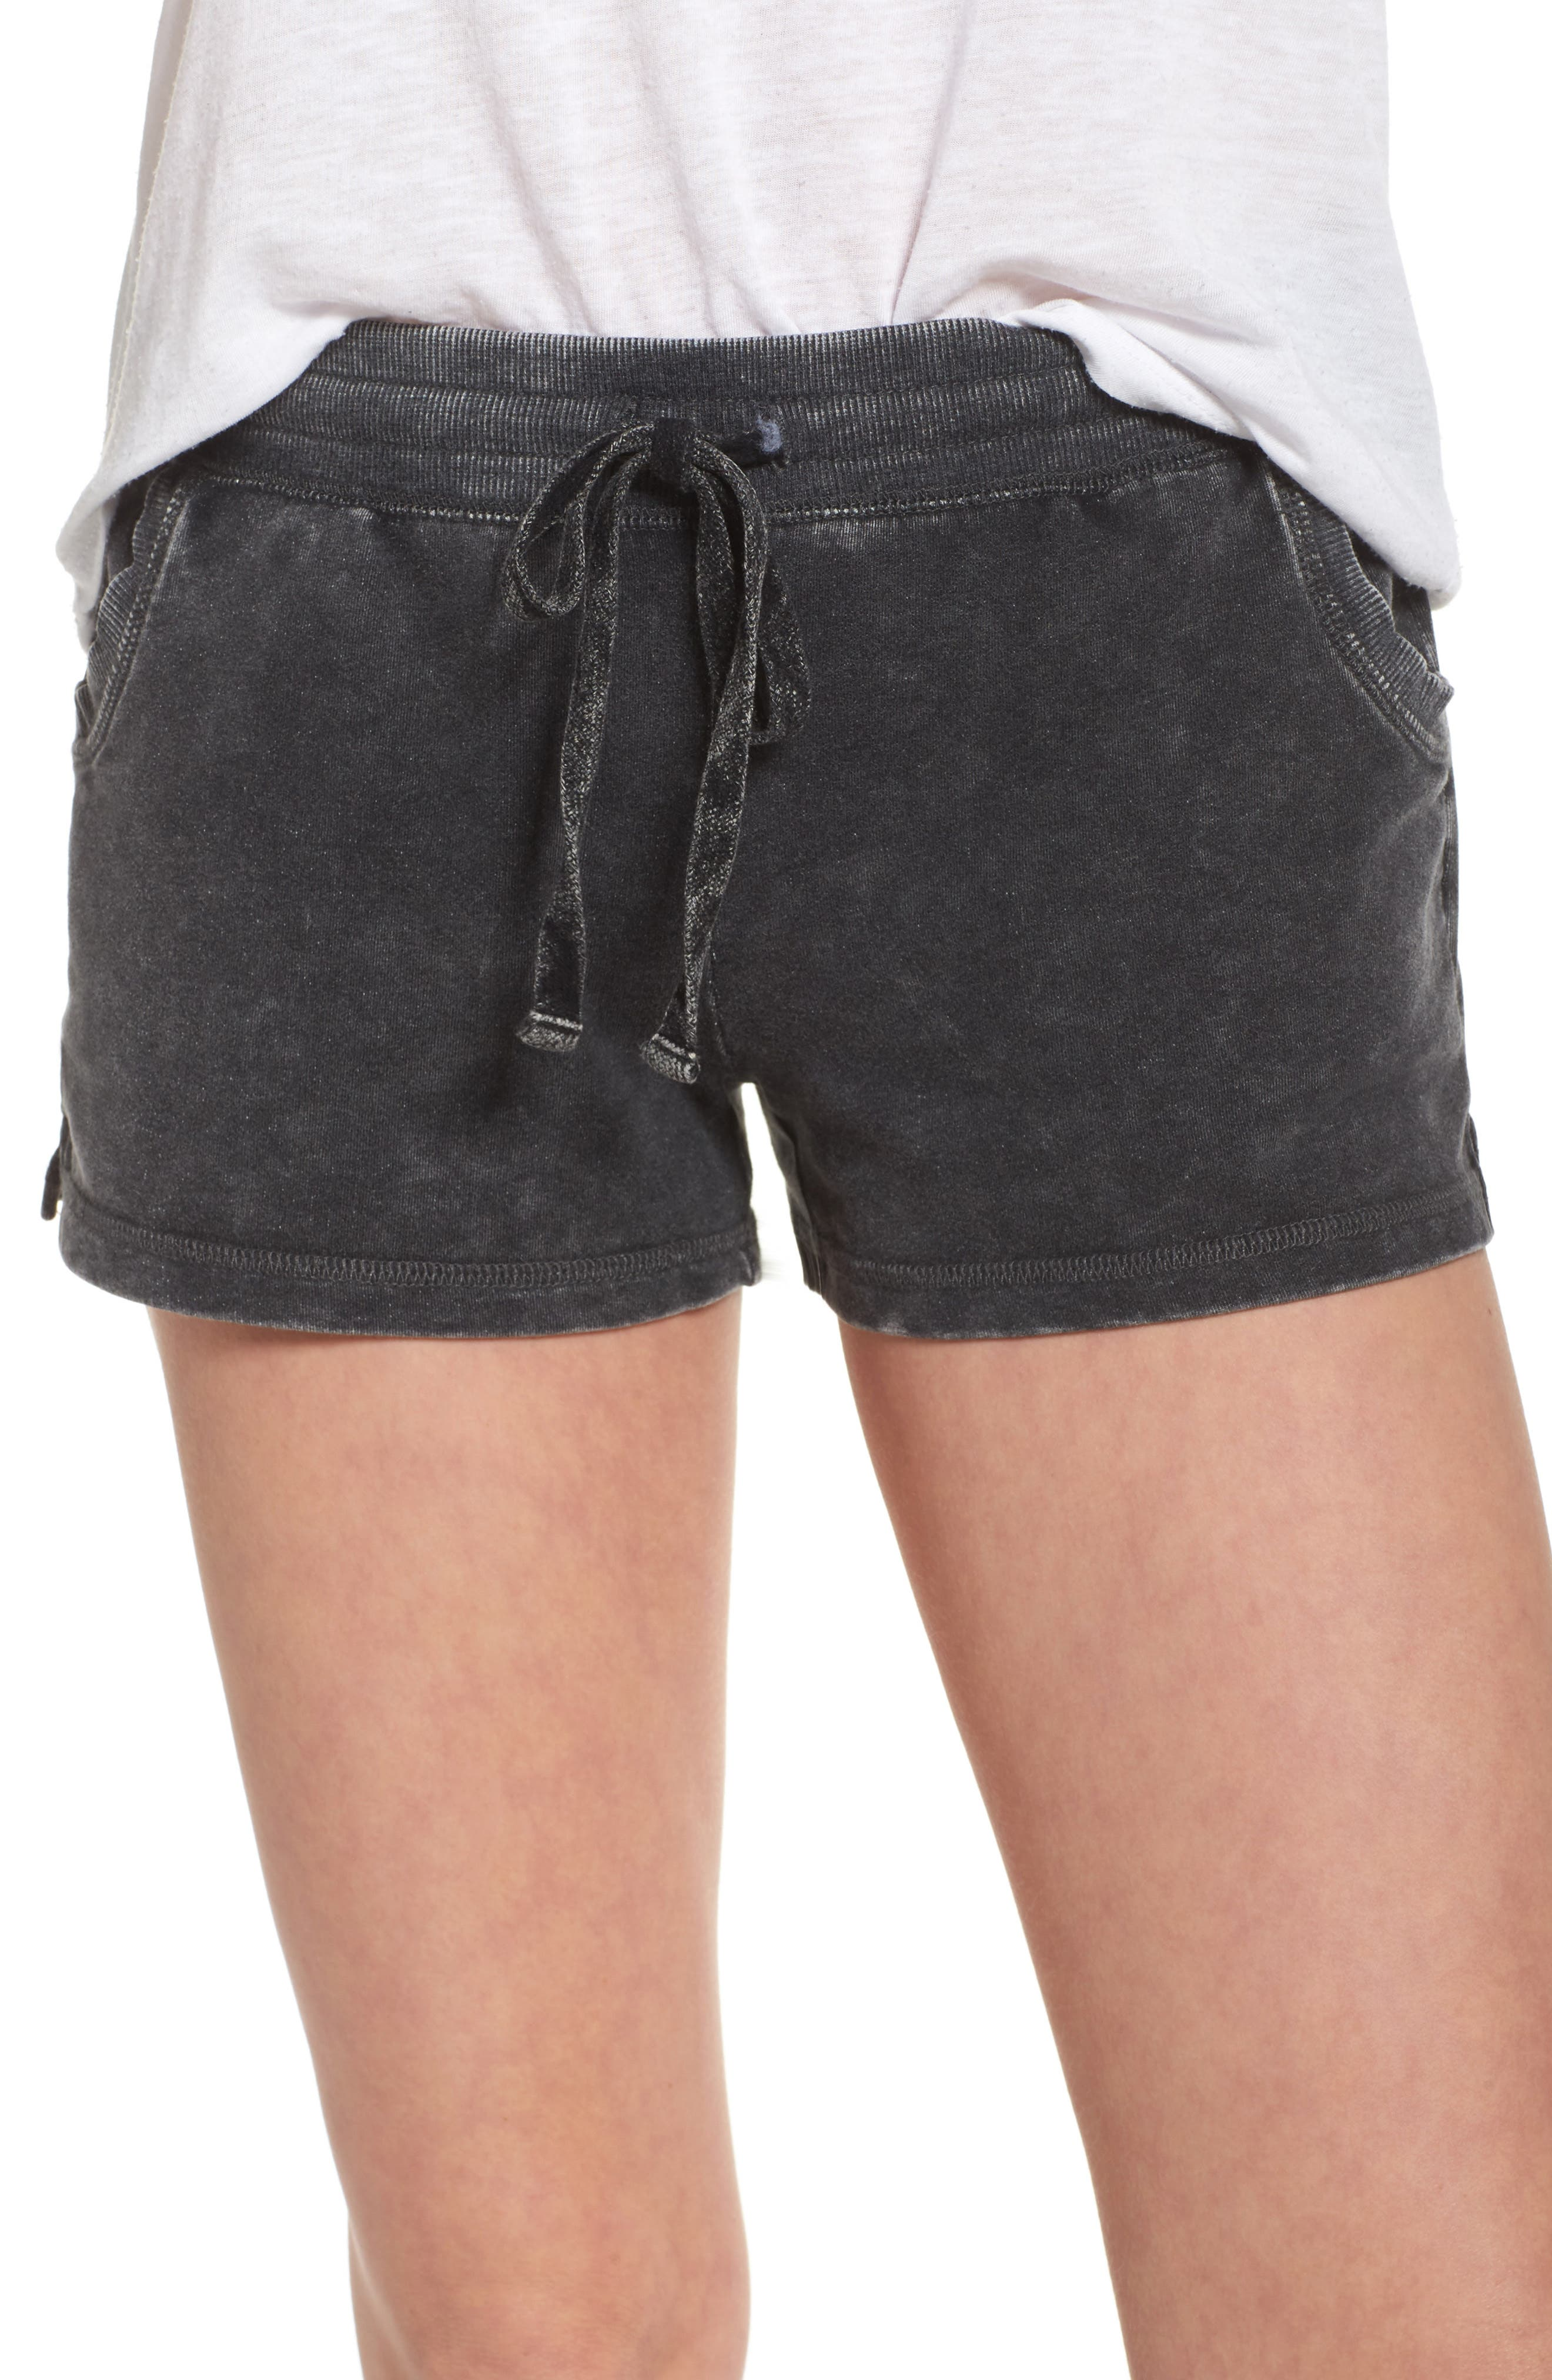 Alternate Image 1 Selected - PJ Salvage Lounge Shorts